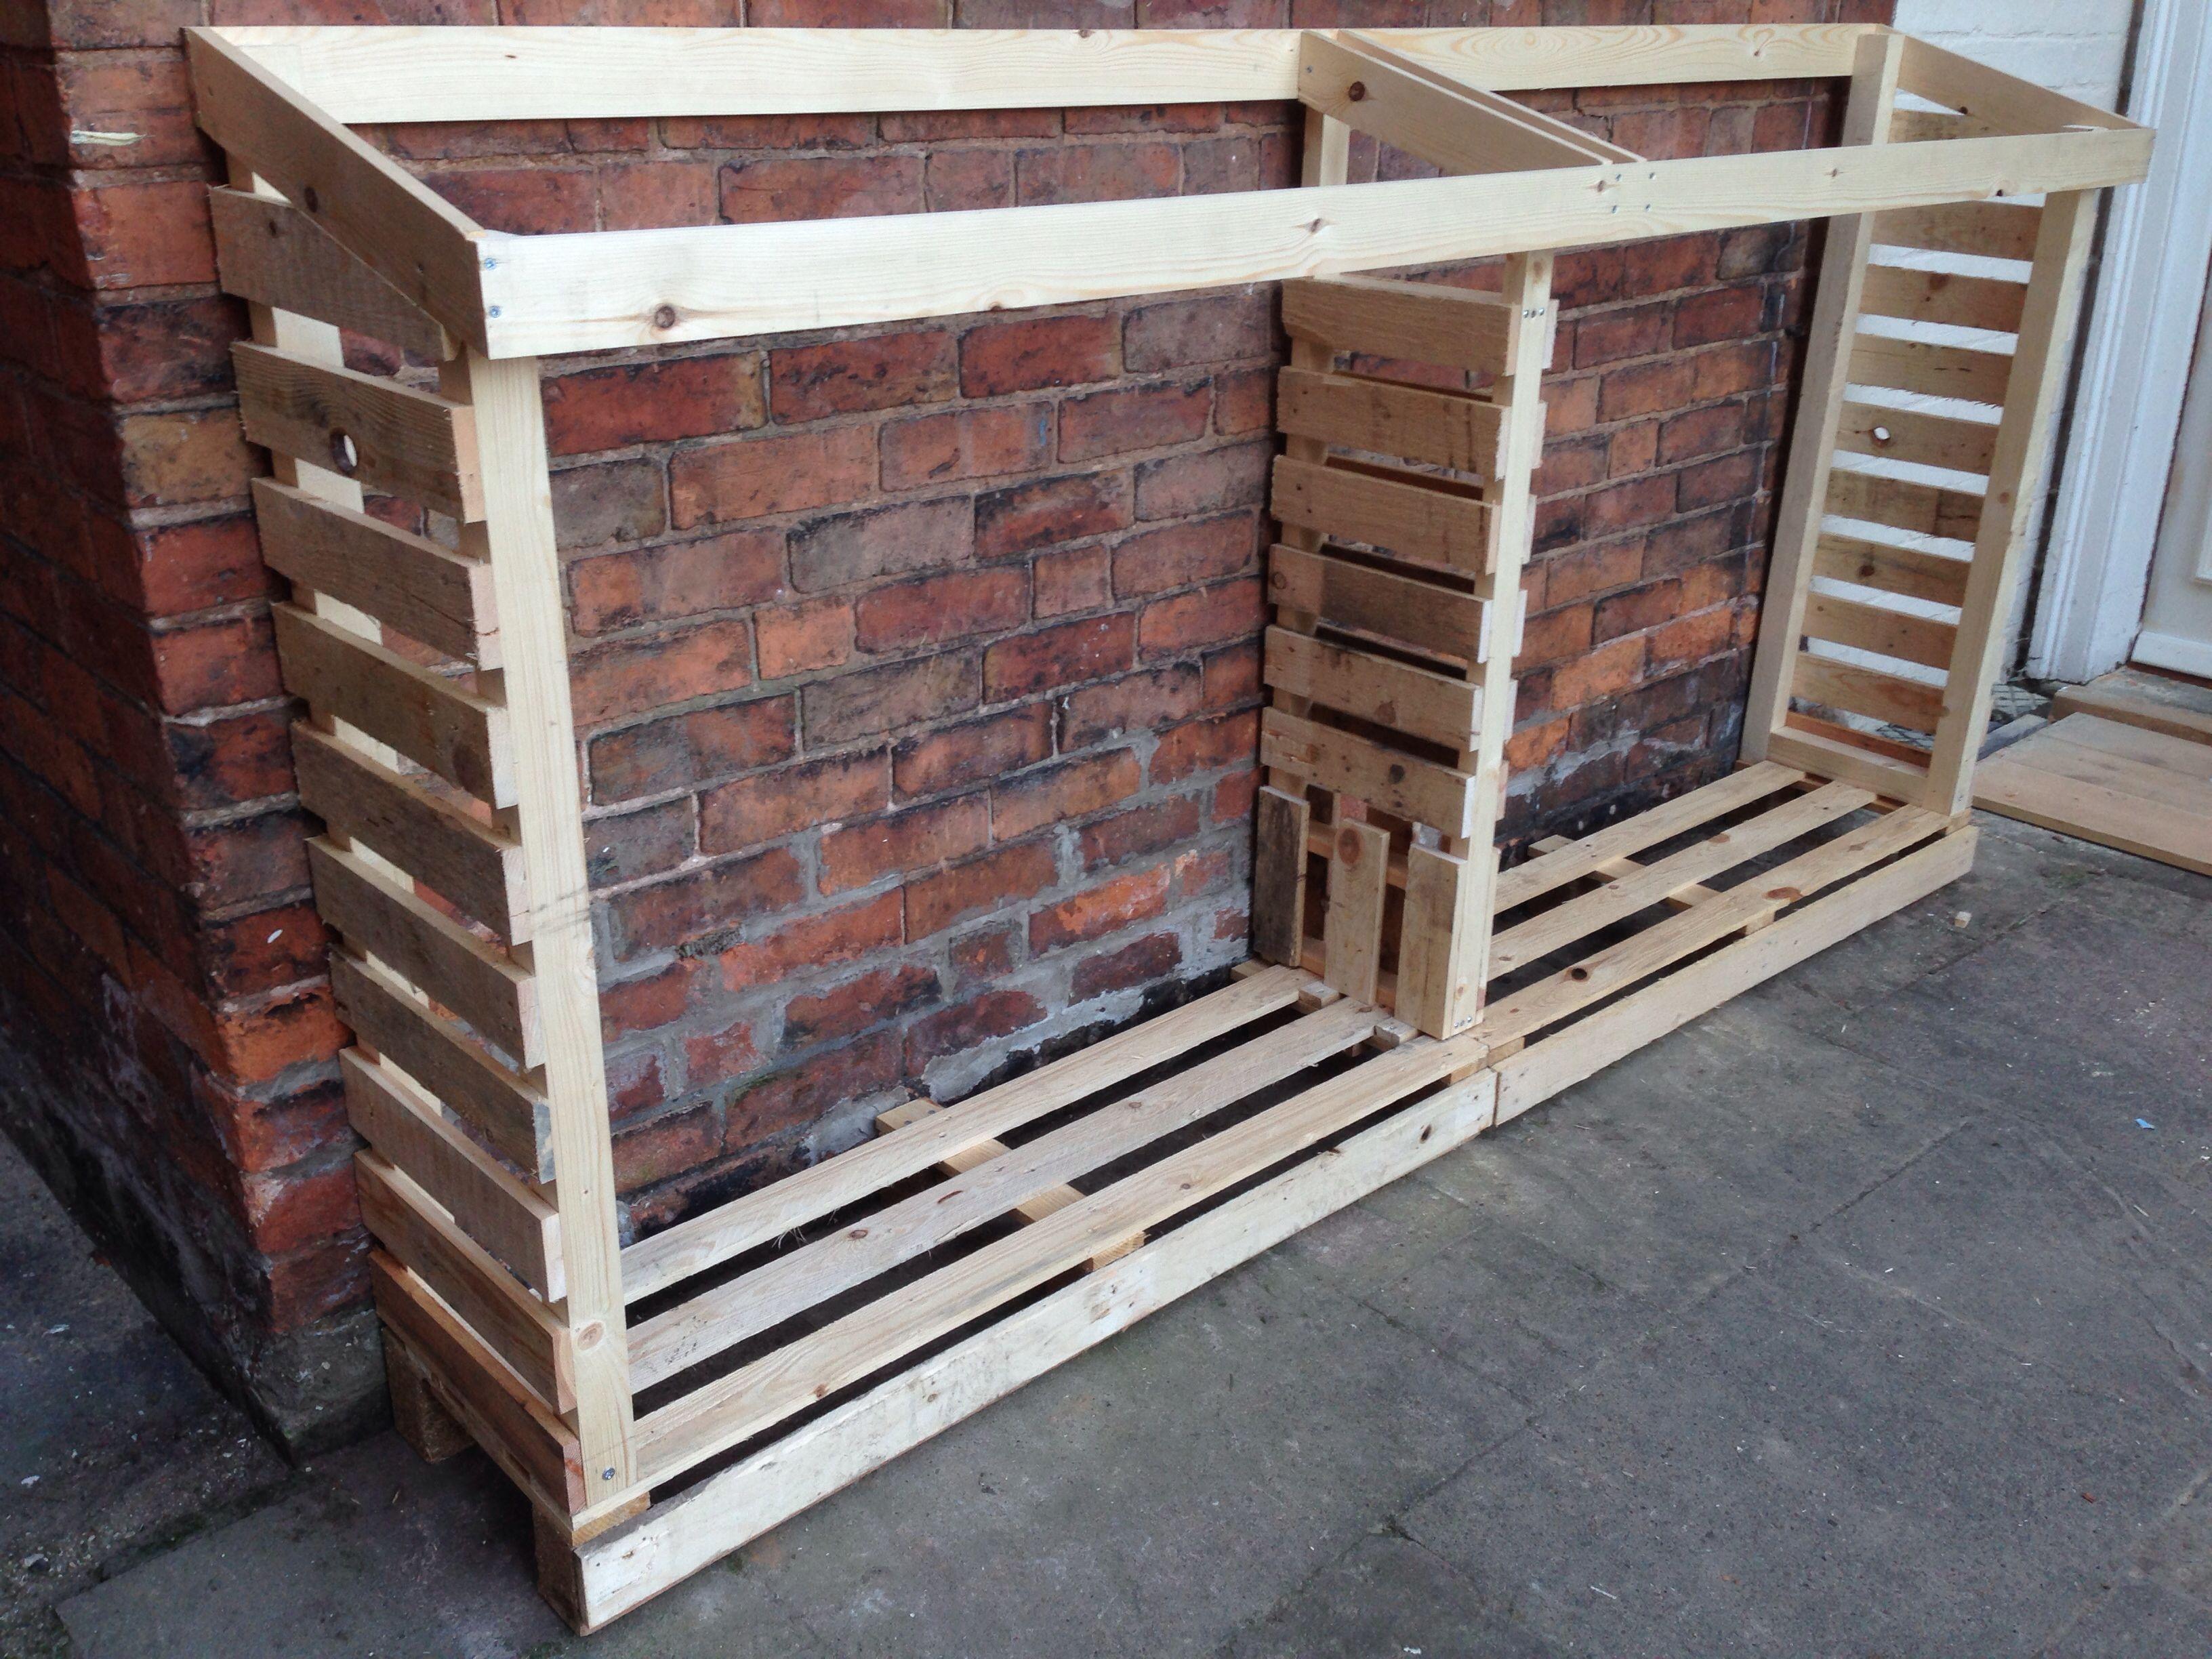 Marvelous Pallet Log Store Mehr. Firewood RackFirewood StorageStacking FirewoodWood  ...